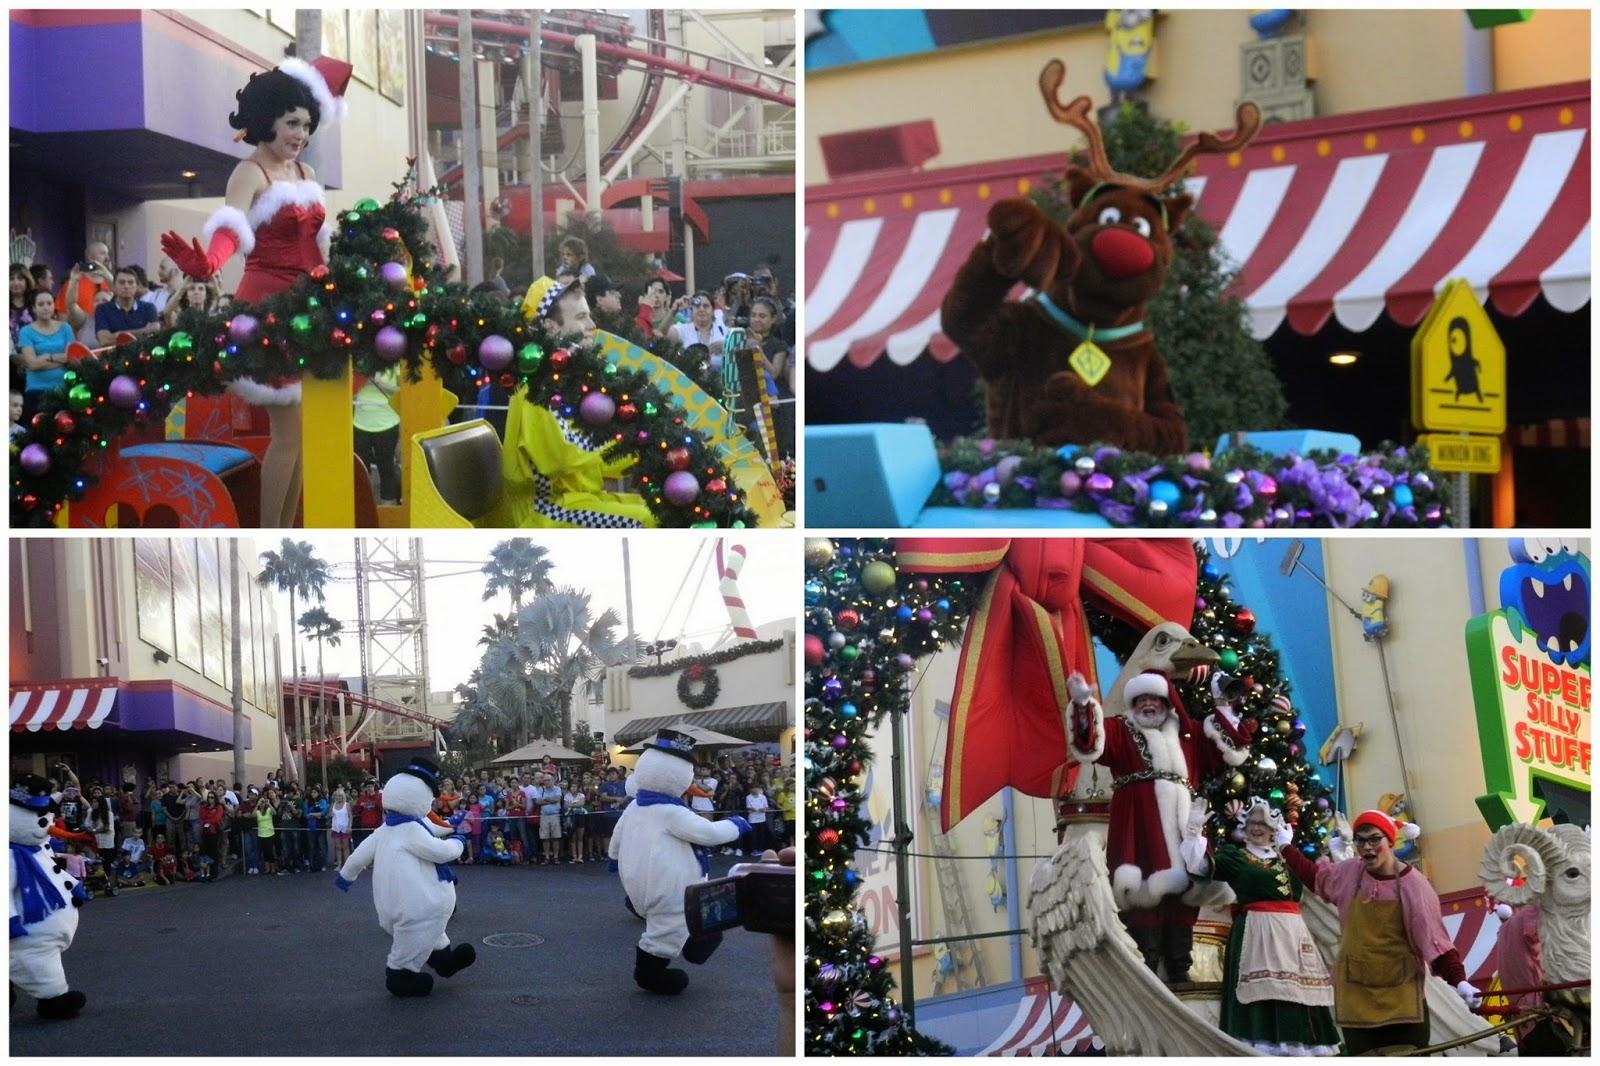 Universal Studios Macy's parade